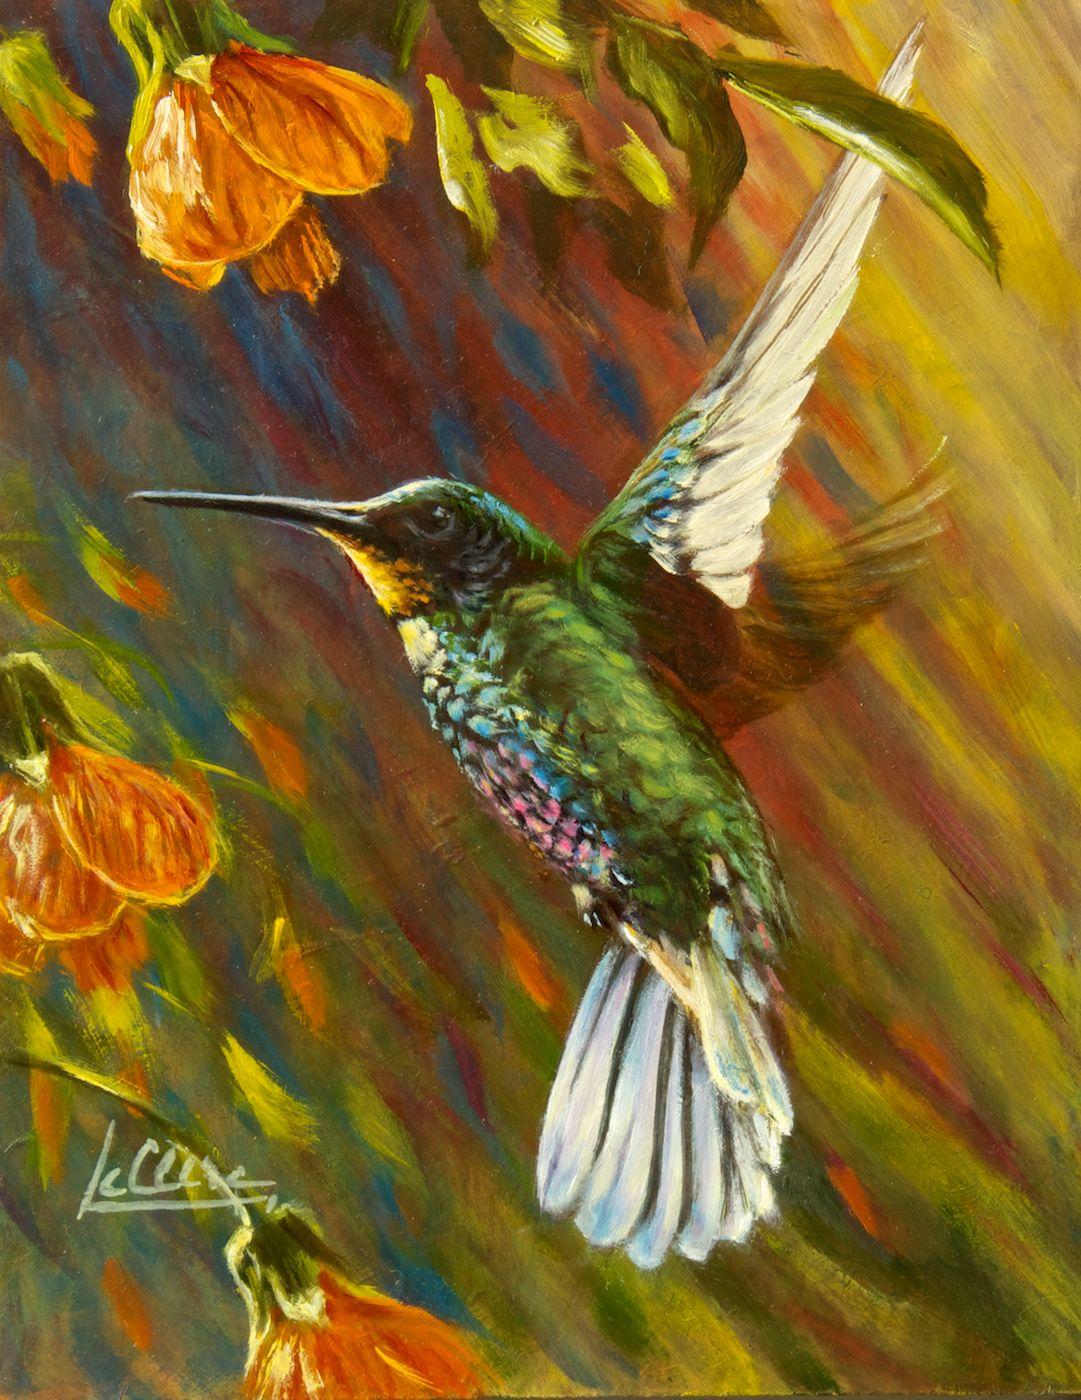 L'art du Colibri